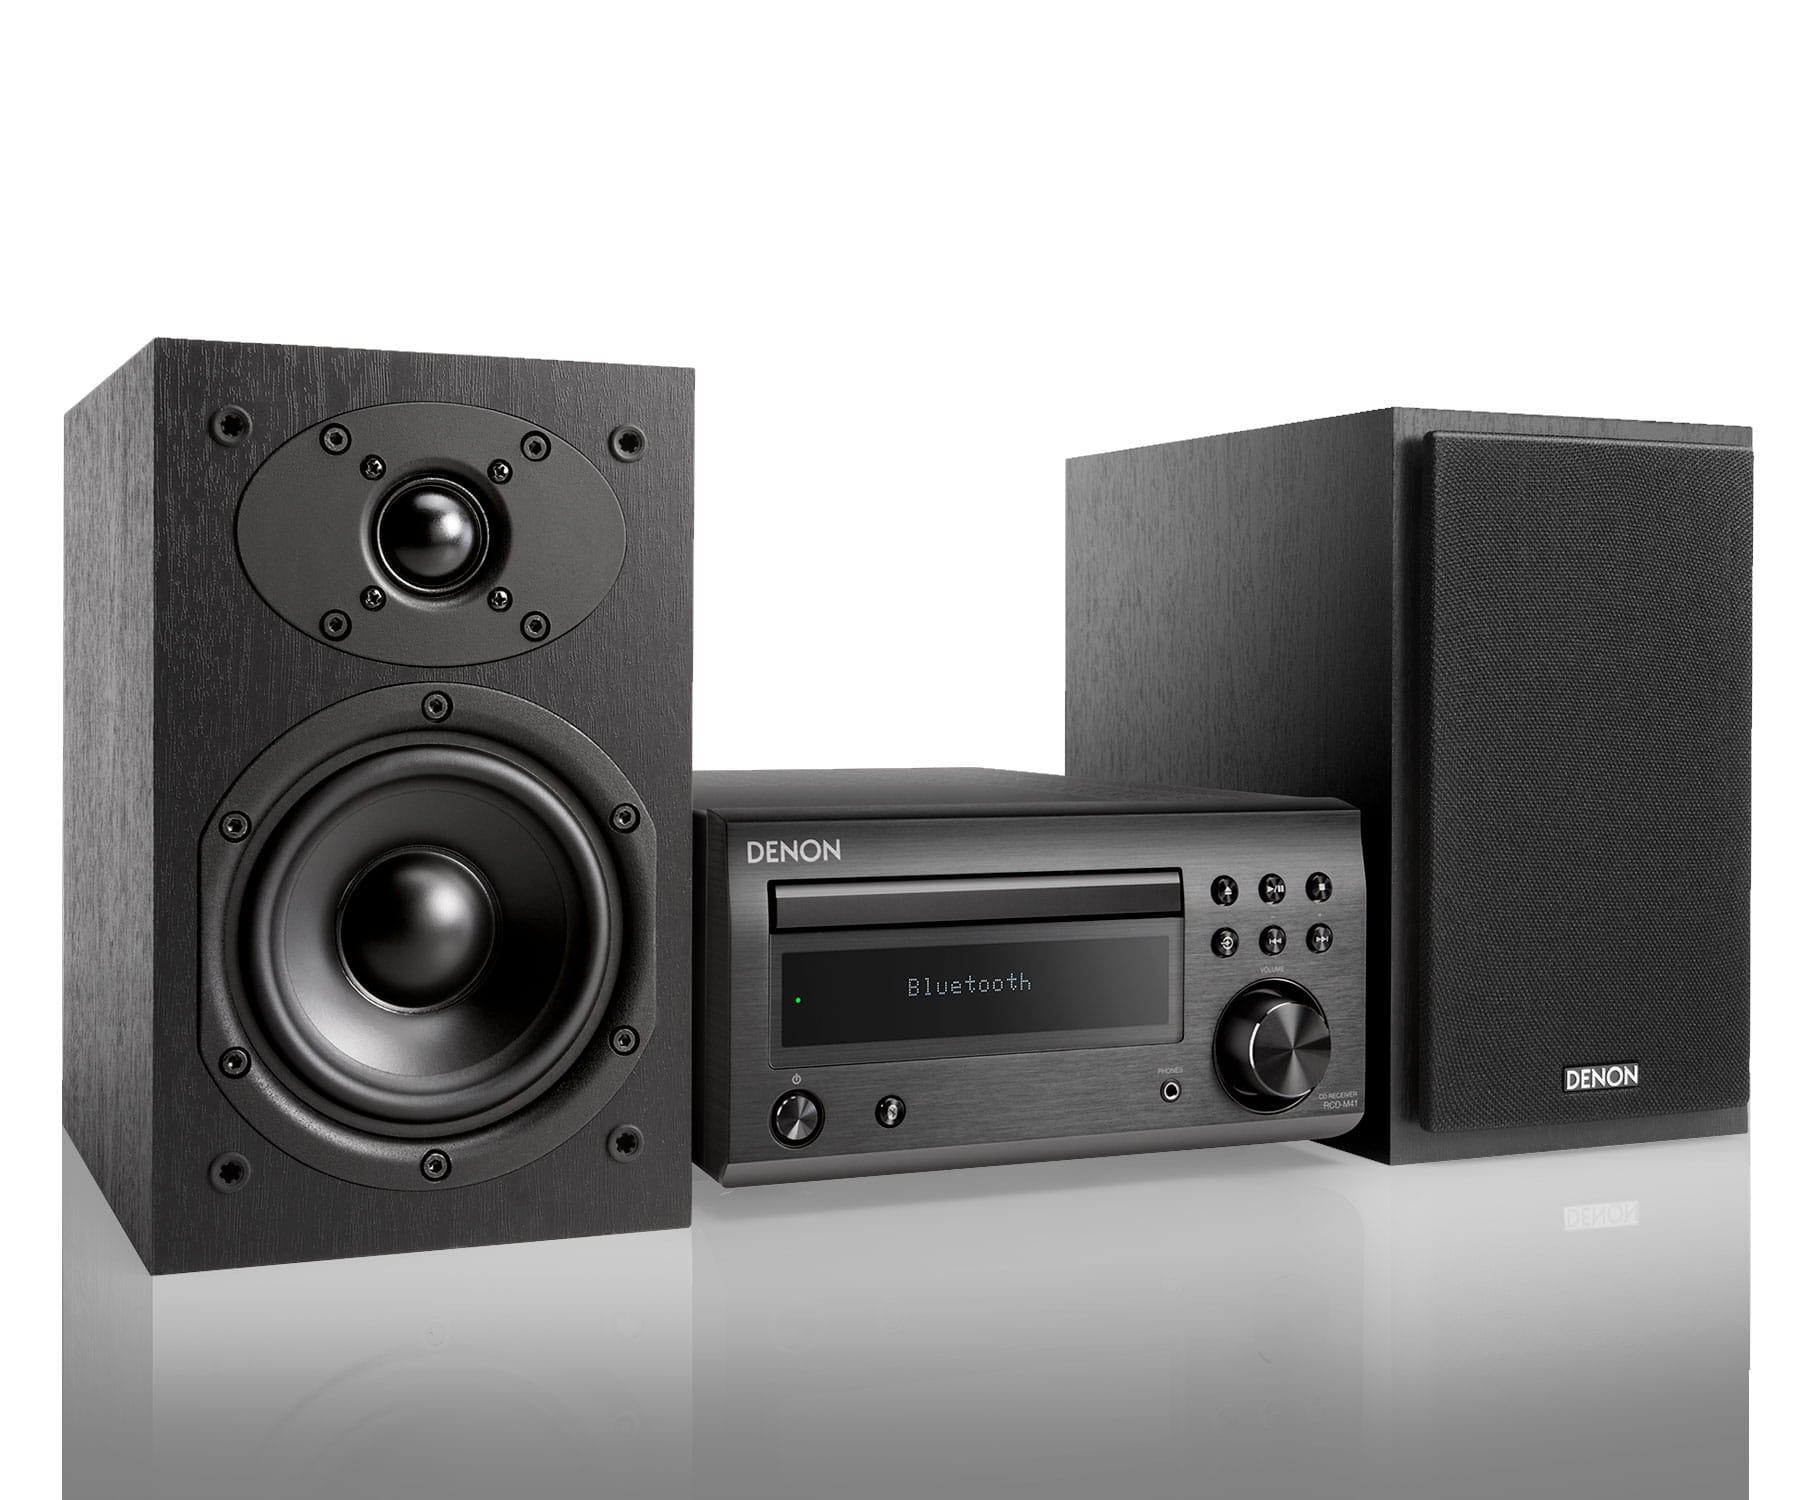 Denon DM-41 Negro Microcadena/Sistema Hi-Fi con CD/Bluetooth/Sintonizador FM/AM